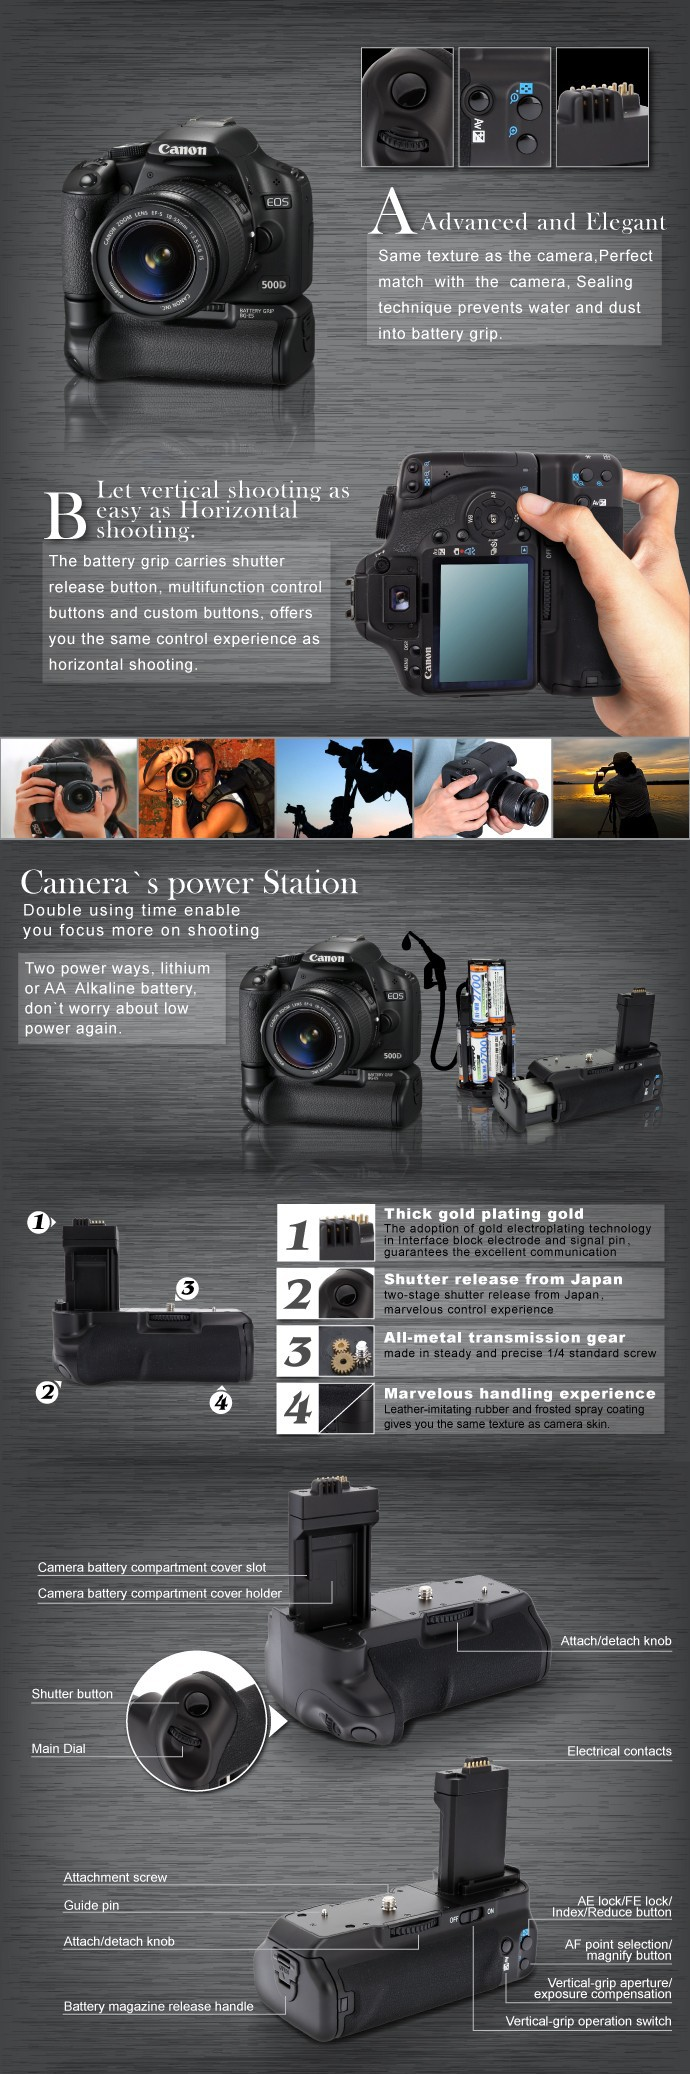 Meike אחיזת סוללה עבור Canon EOS 450D 500D 1000D XSi T1i XS BG-E5